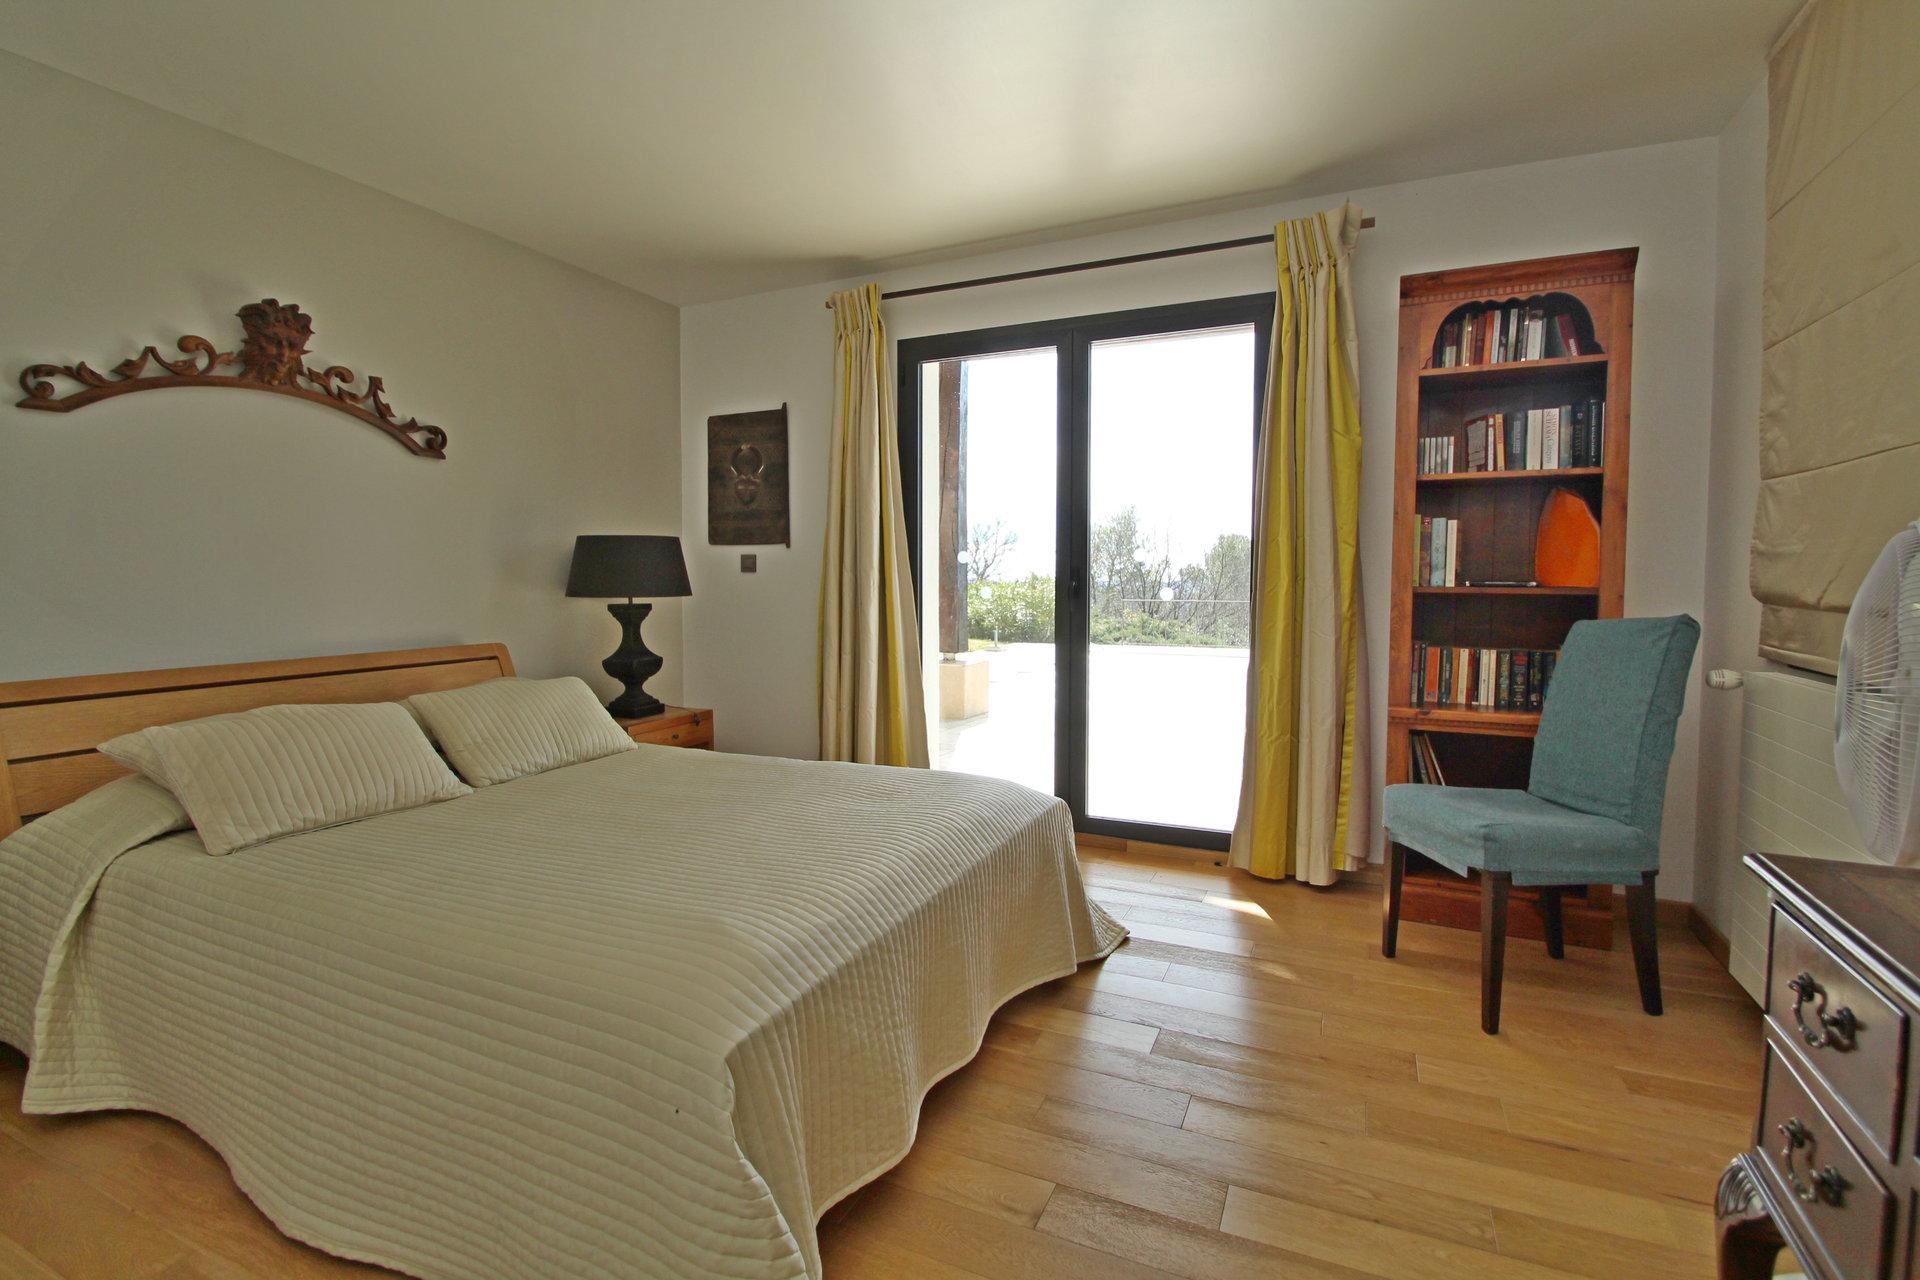 Fayence regio: prachtige moderne villa in de natuur